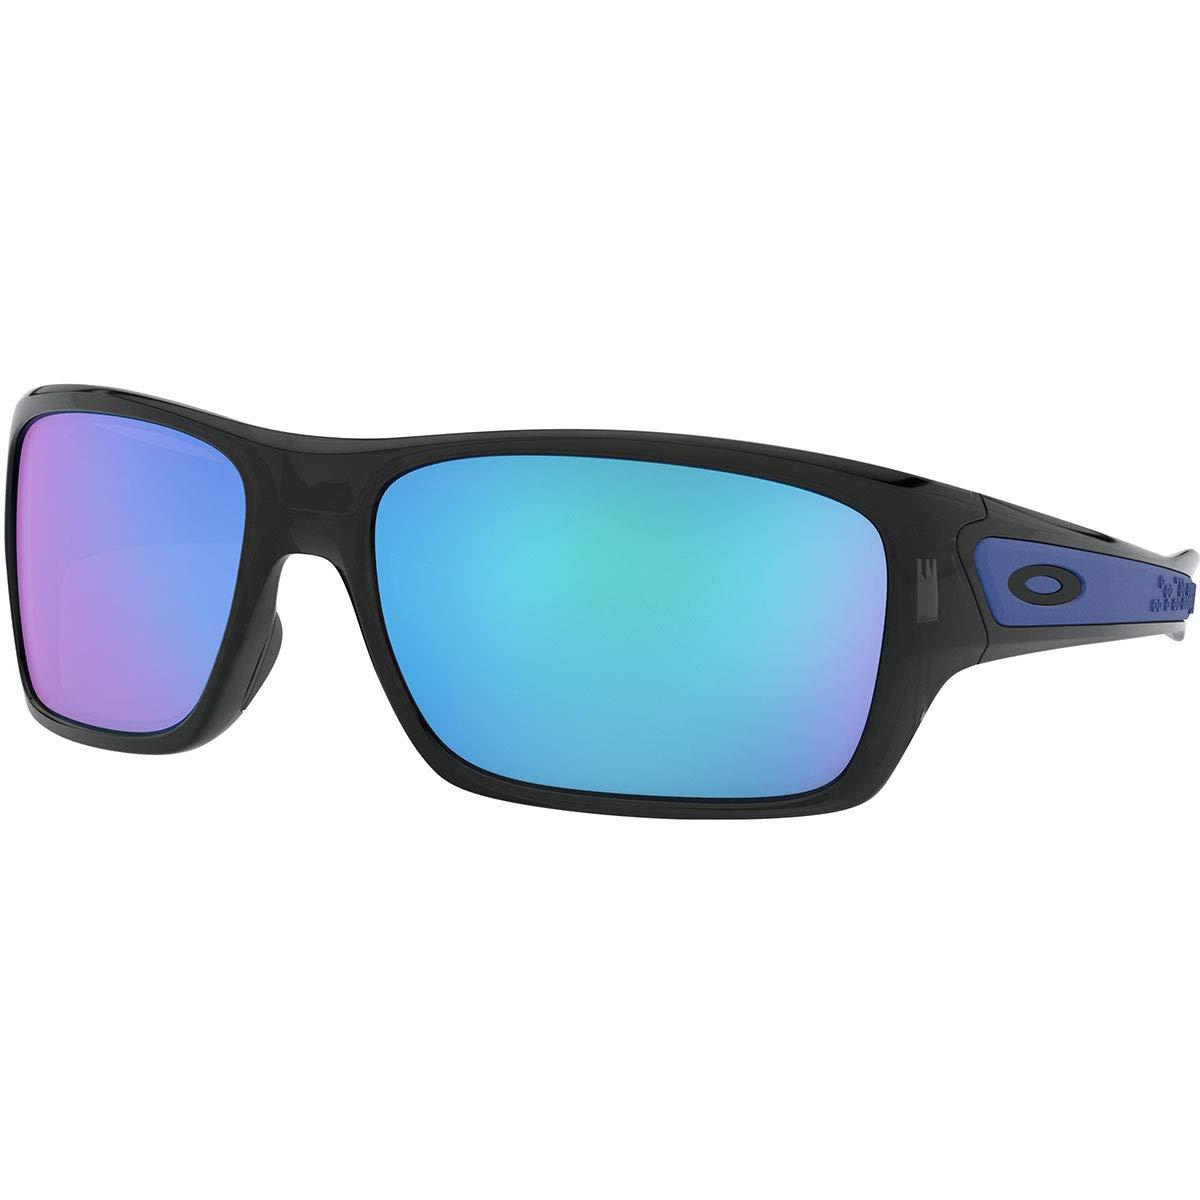 Oakley Men's OO9263 Turbine Rectangular Sunglasses, Black Ink/Sapphire Iridium, 65 mm by Oakley